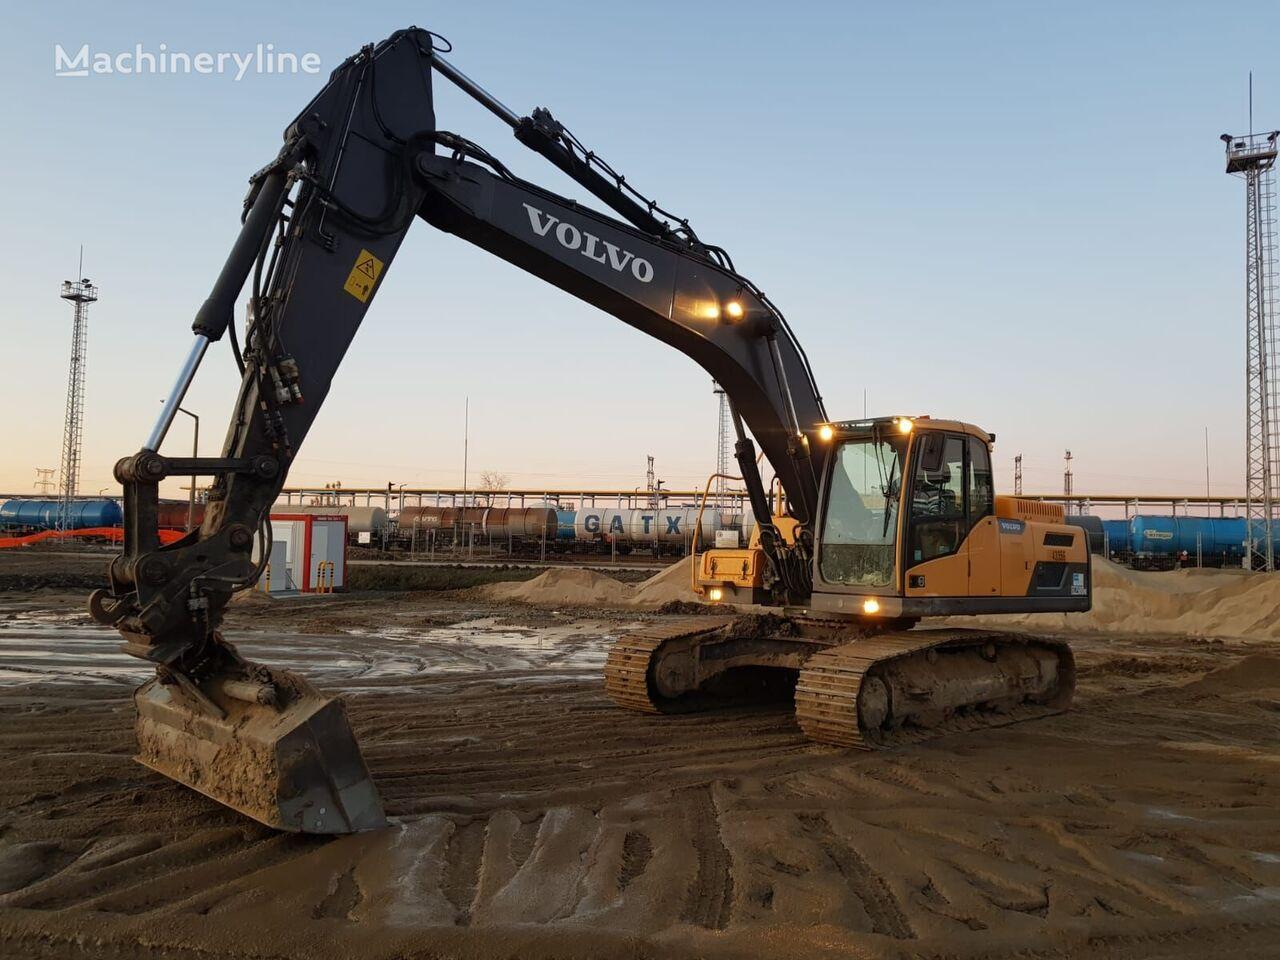 VOLVO ec 250 DLN tracked excavator